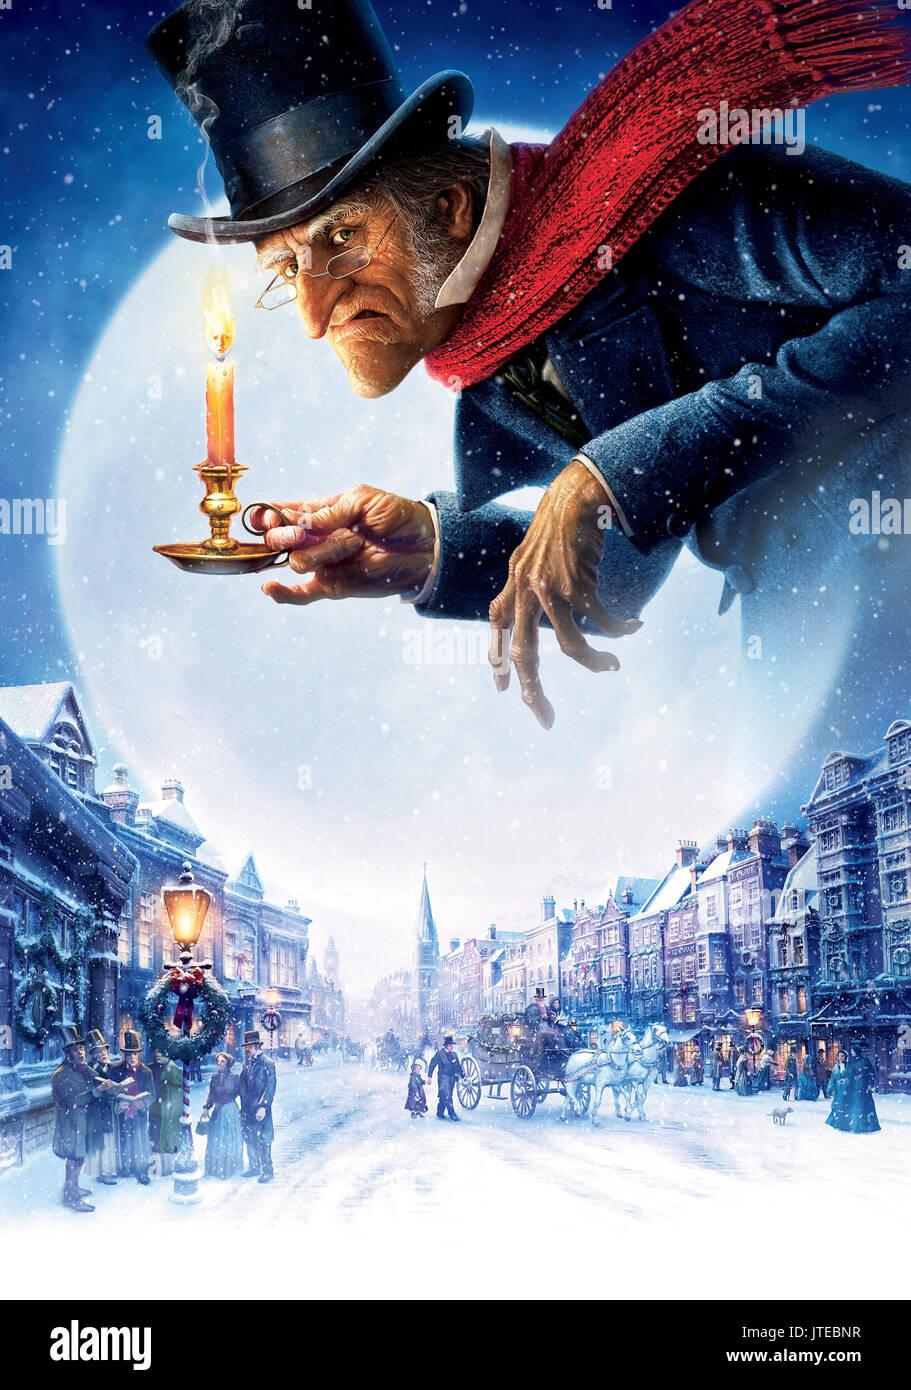 Ebenezer Scrooge A Christmas Carol 2009 Stock Photo 152751251 Alamy